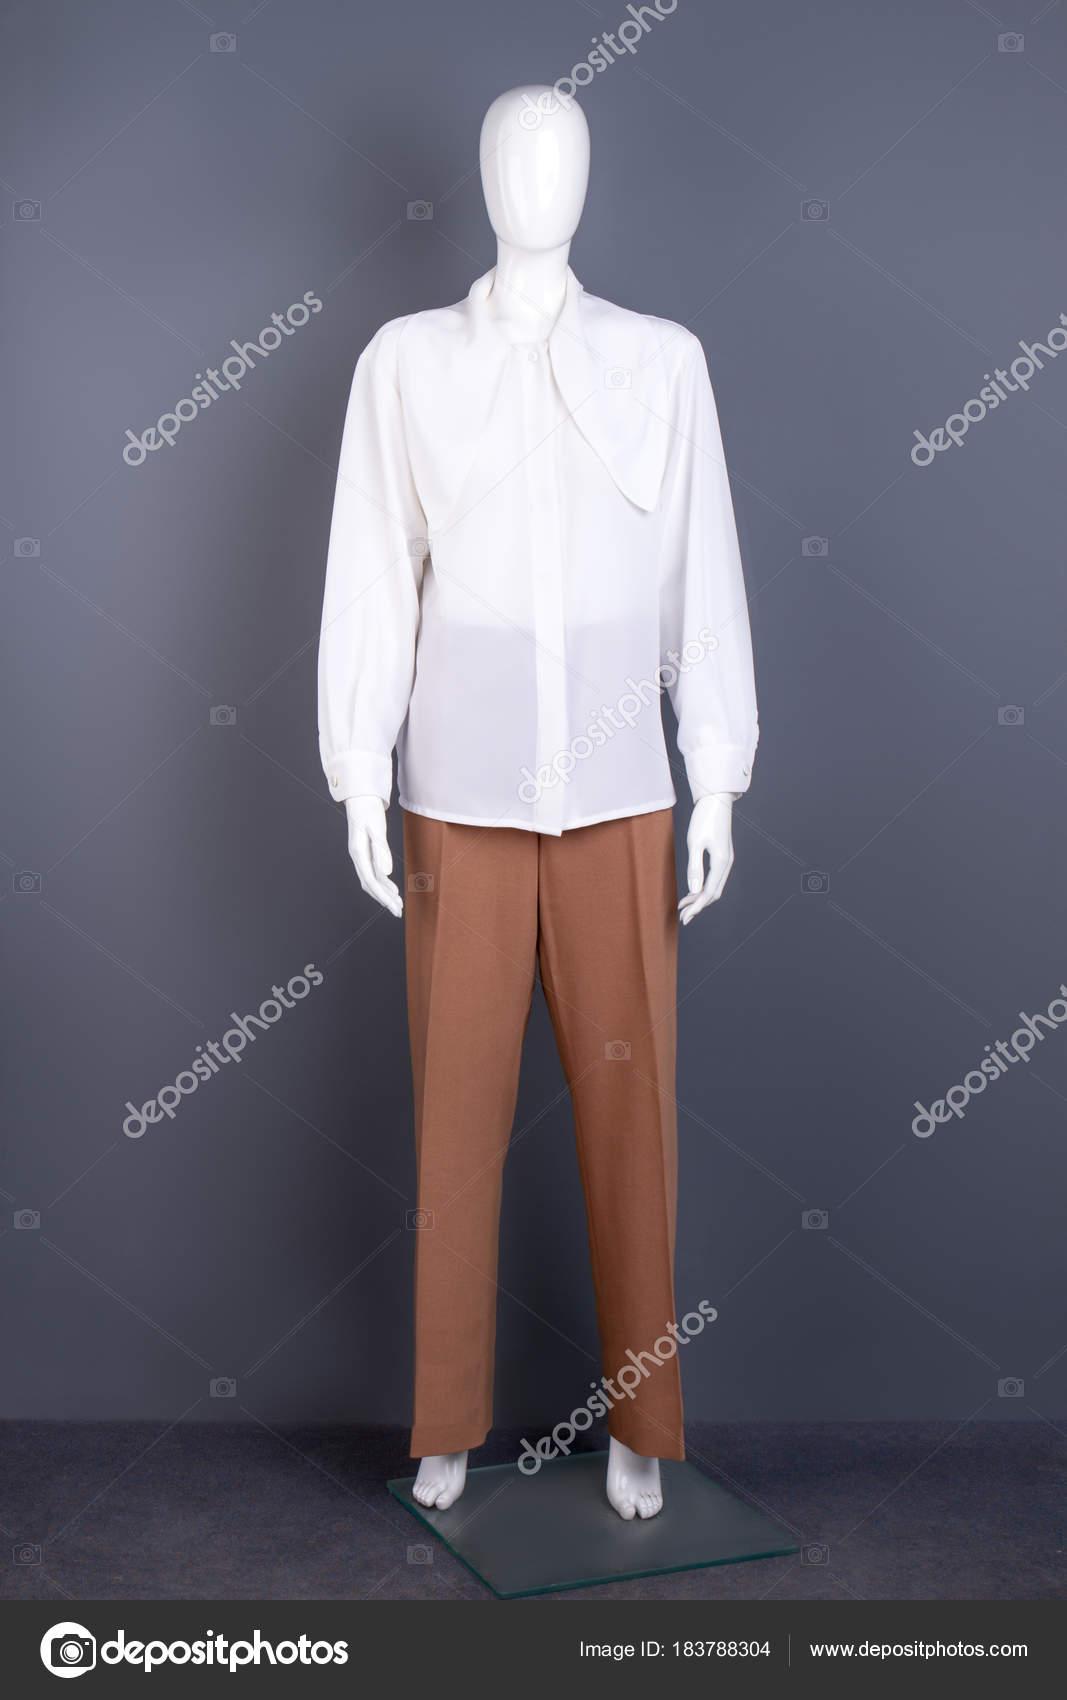 71a374c22e1e Γυναικών λευκό πουκάμισο Σιφόν σε μανεκέν. Πλήρες μήκος ανδρεικέλου  ντυμένοι με μακριά μανίκια μπλούζα και παντελόνι καφέ